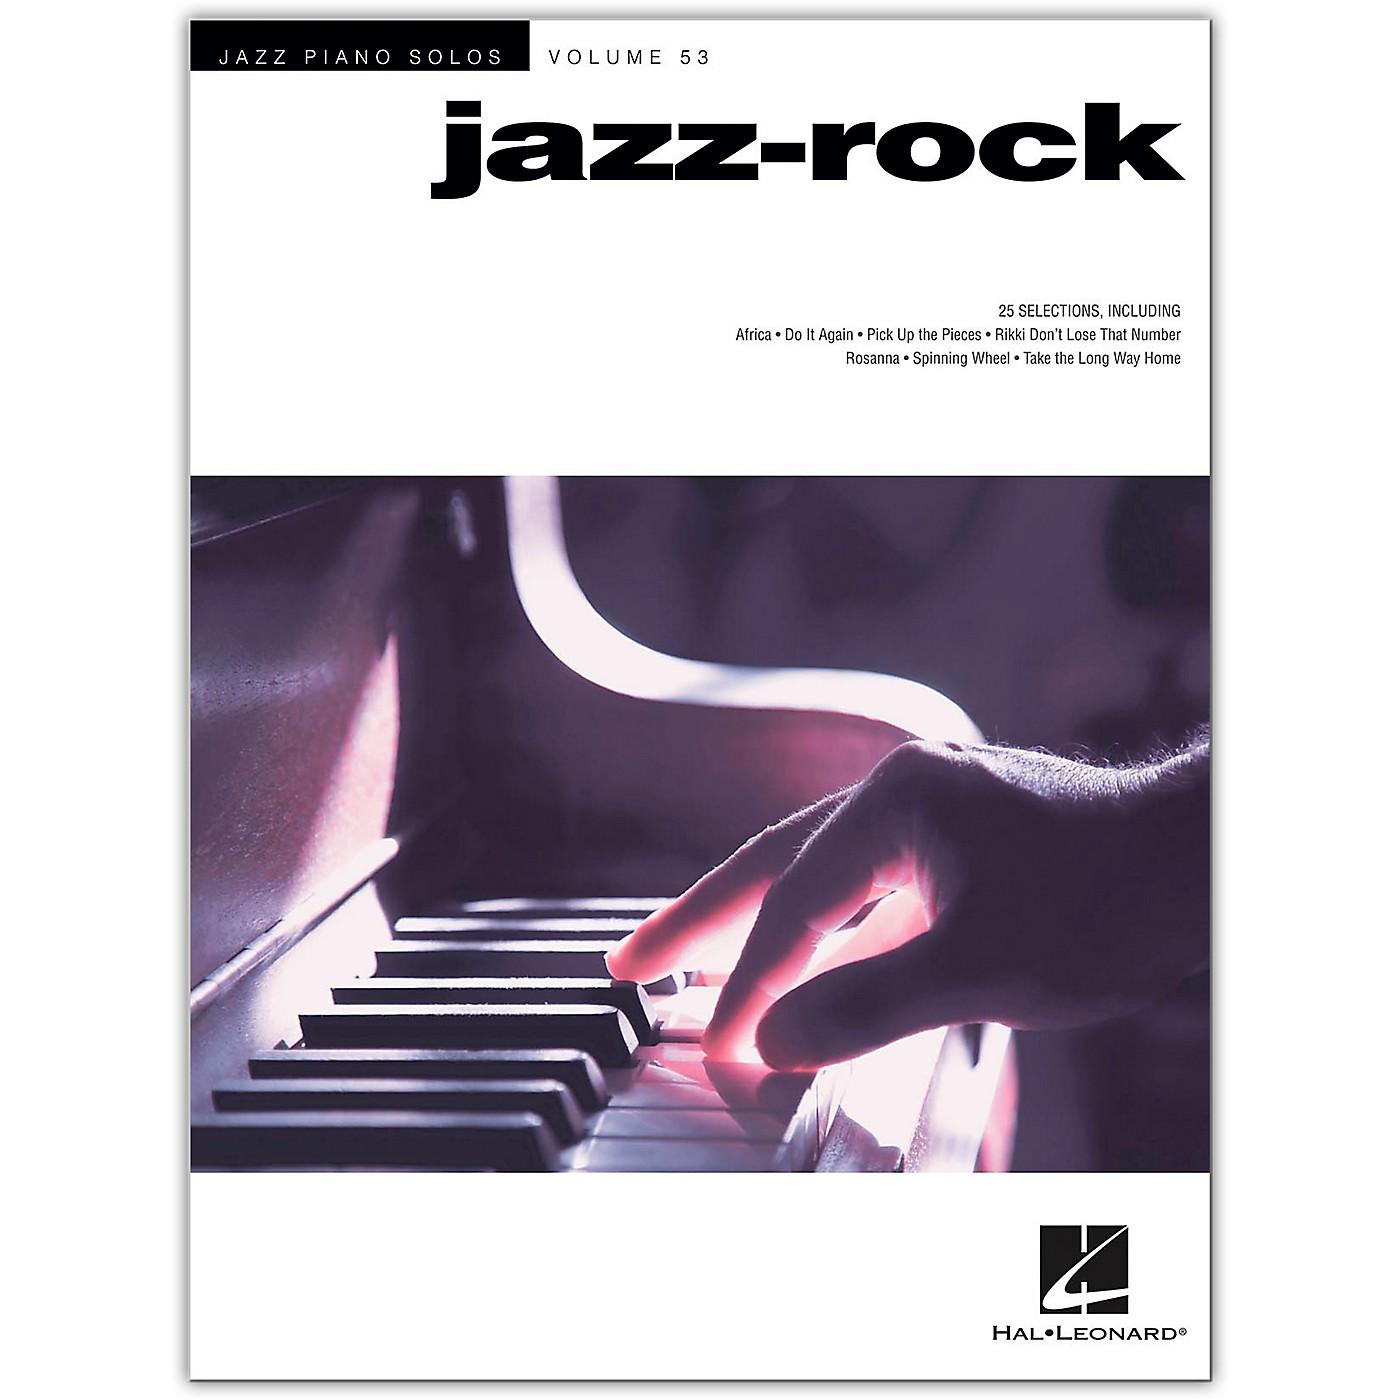 Hal Leonard Jazz-Rock - Jazz Piano Solos Series Volume 53 for solo piano thumbnail